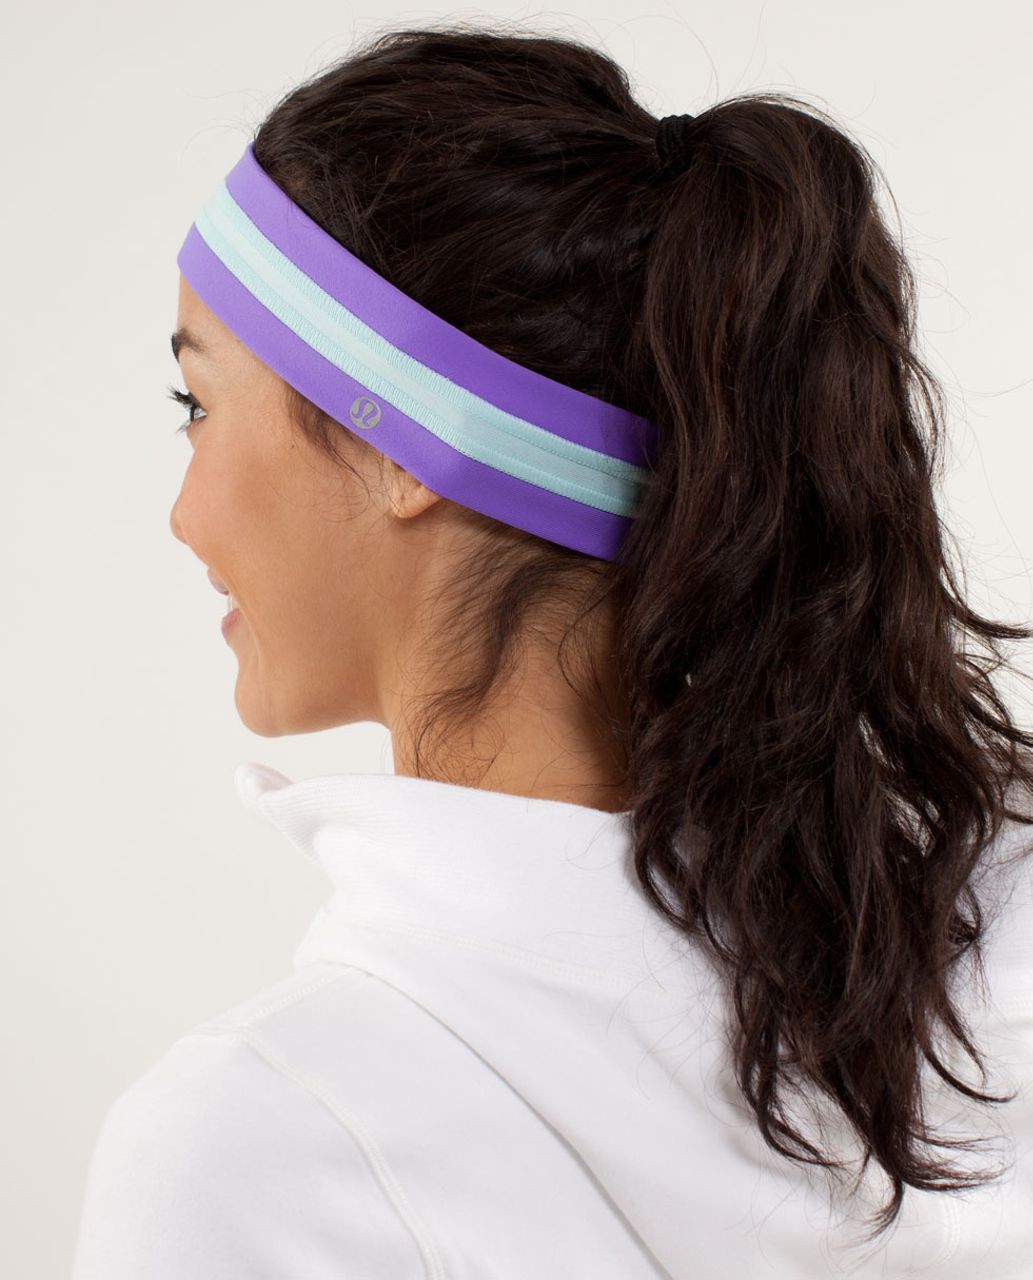 Lululemon Fly Away Tamer Headband - Power Purple / Aquamarine